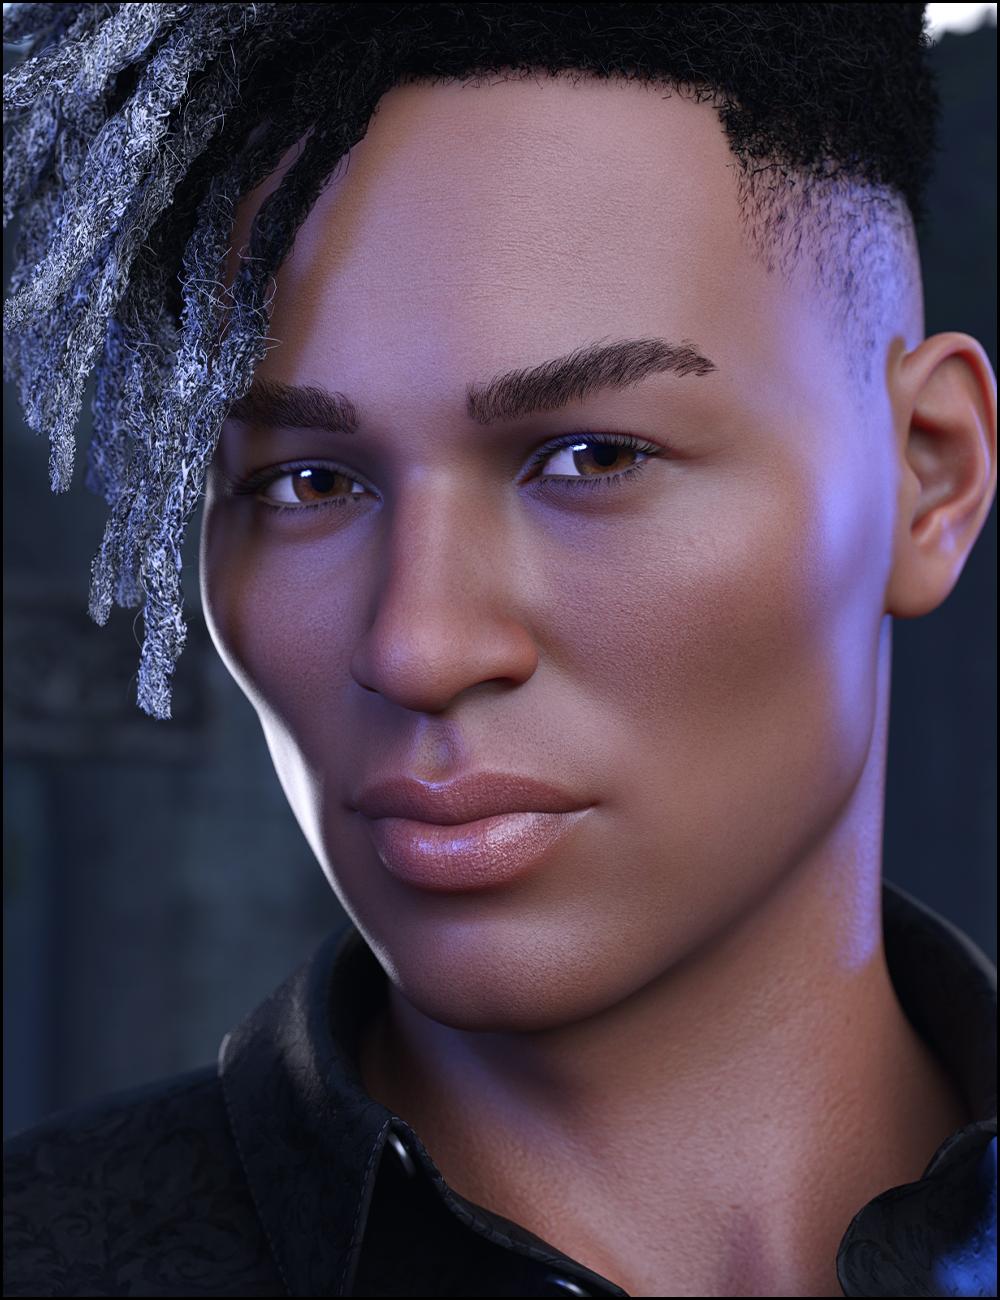 Romere for Genesis 8 Male by: Jessaii, 3D Models by Daz 3D